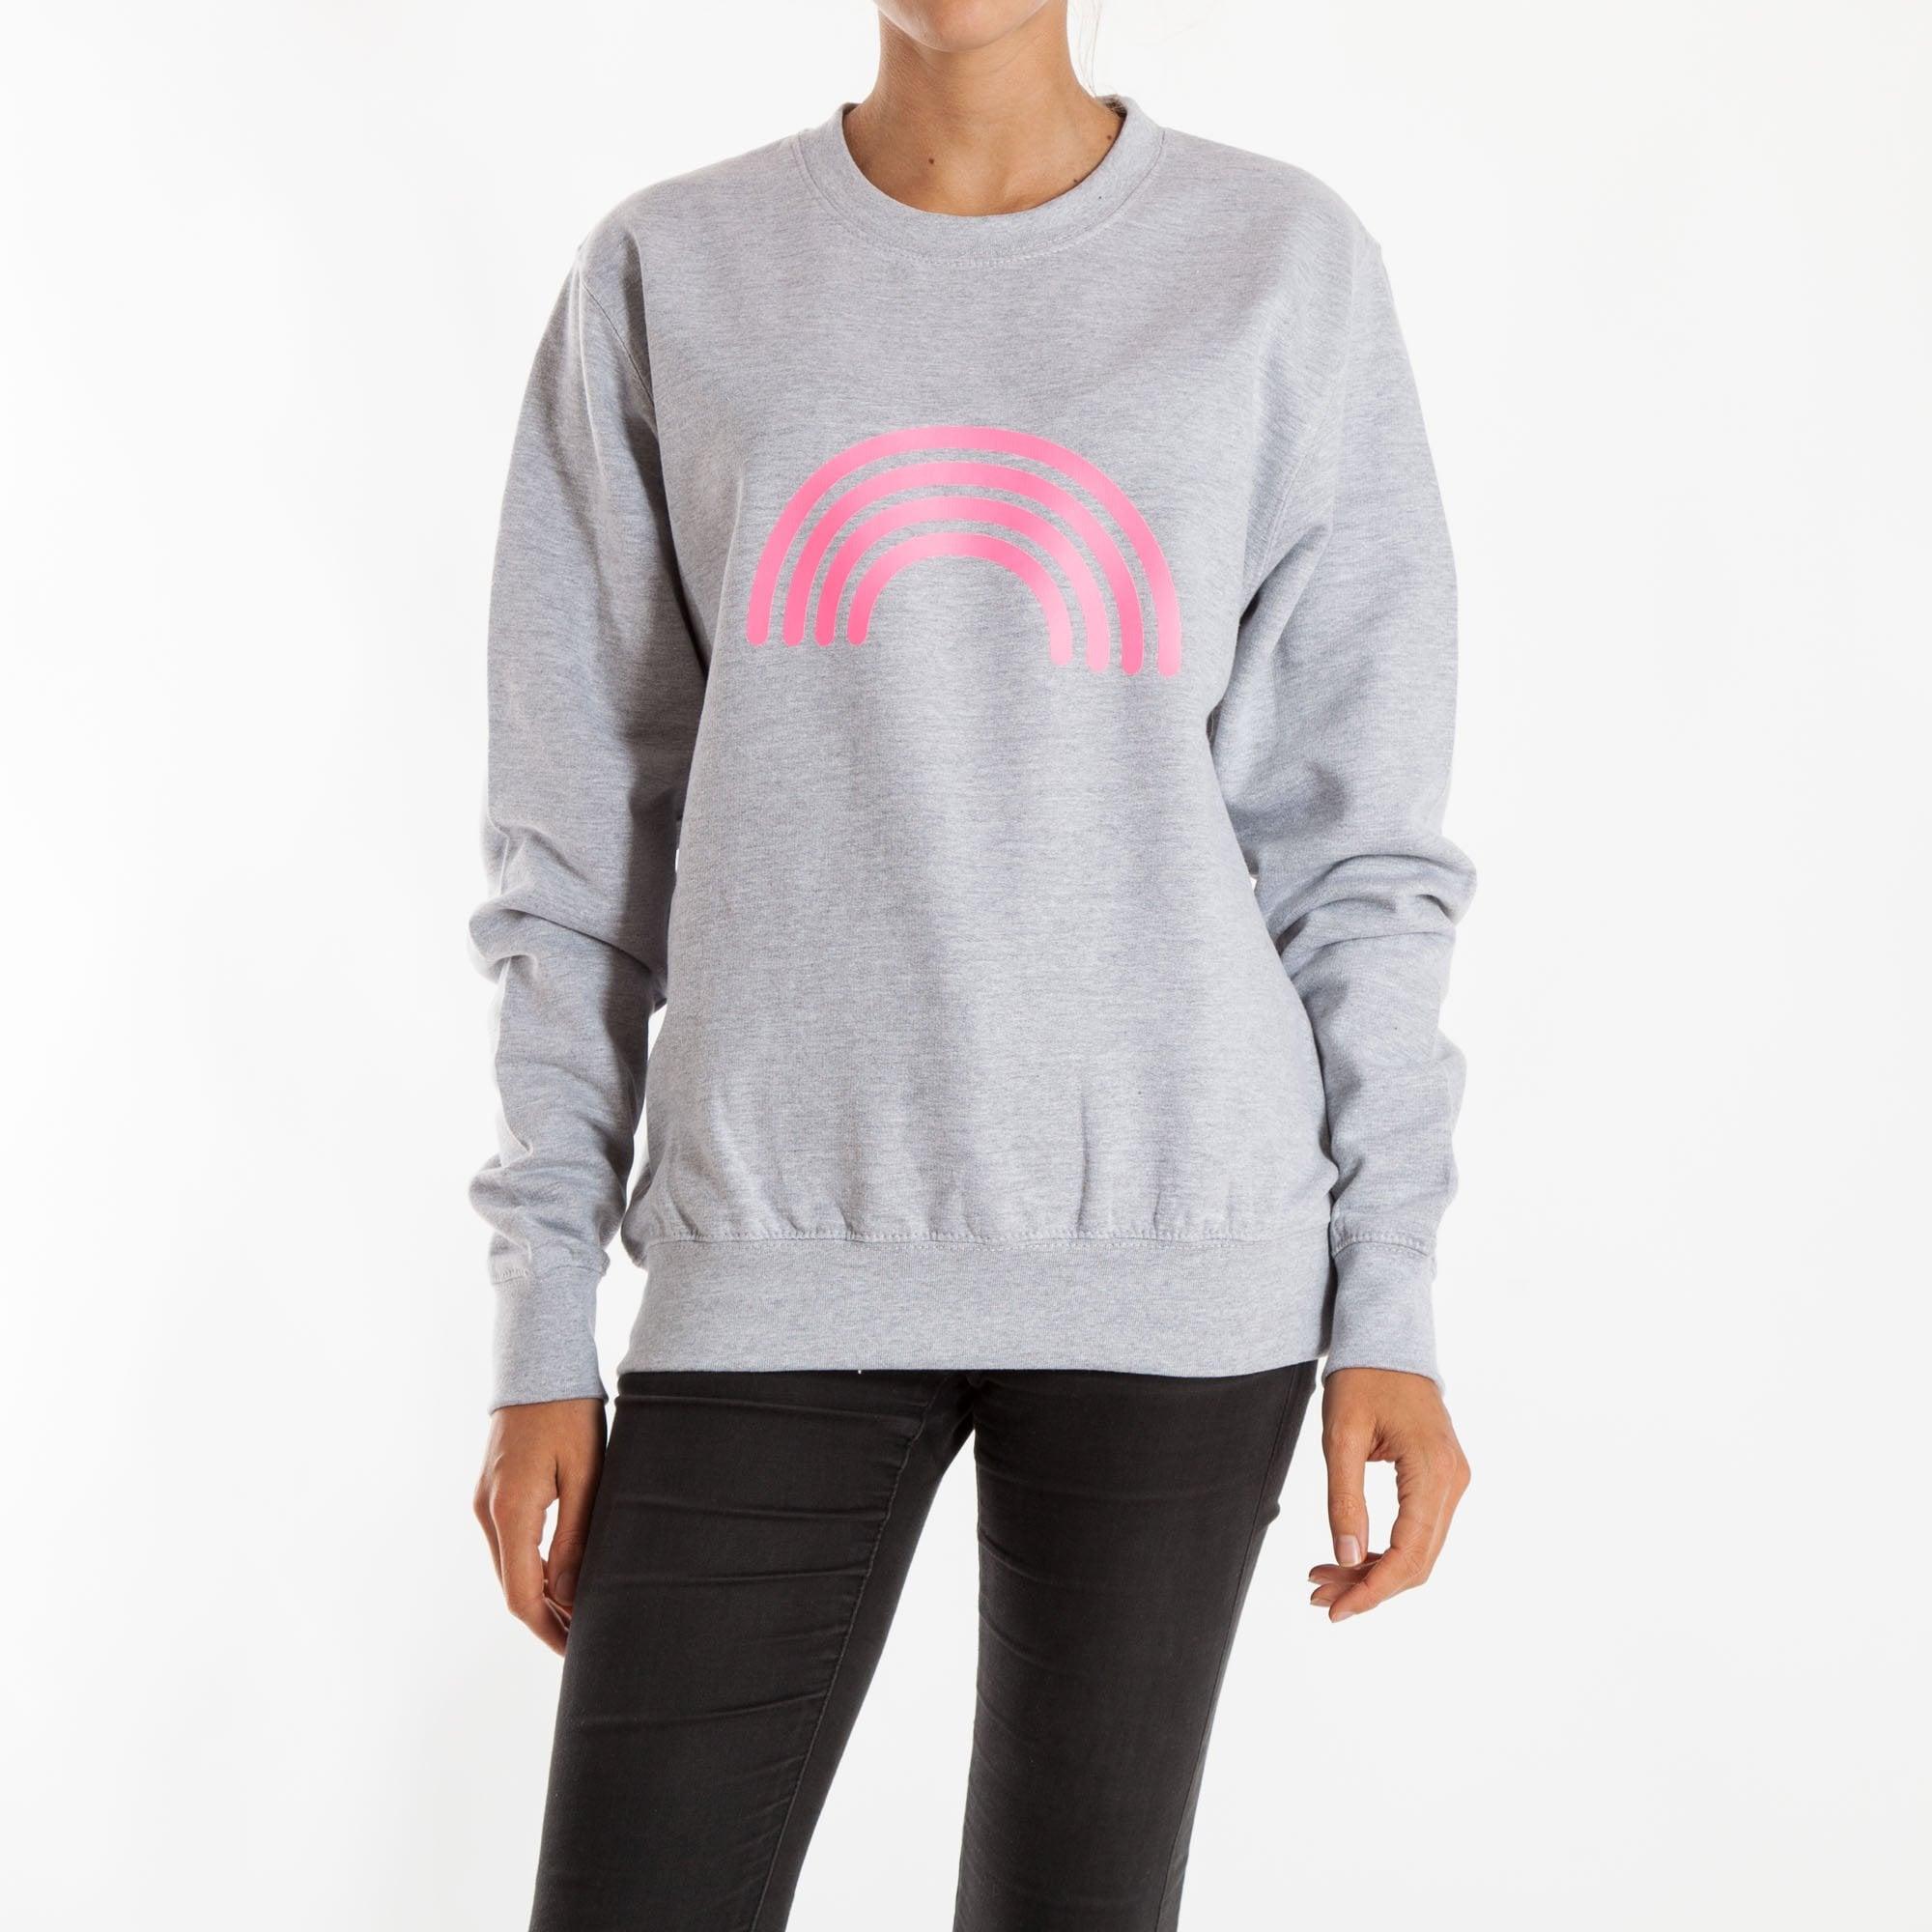 0dd56f1aa1583 Rainbow Boyfriend Sweatshirt in Grey/Neon Pink